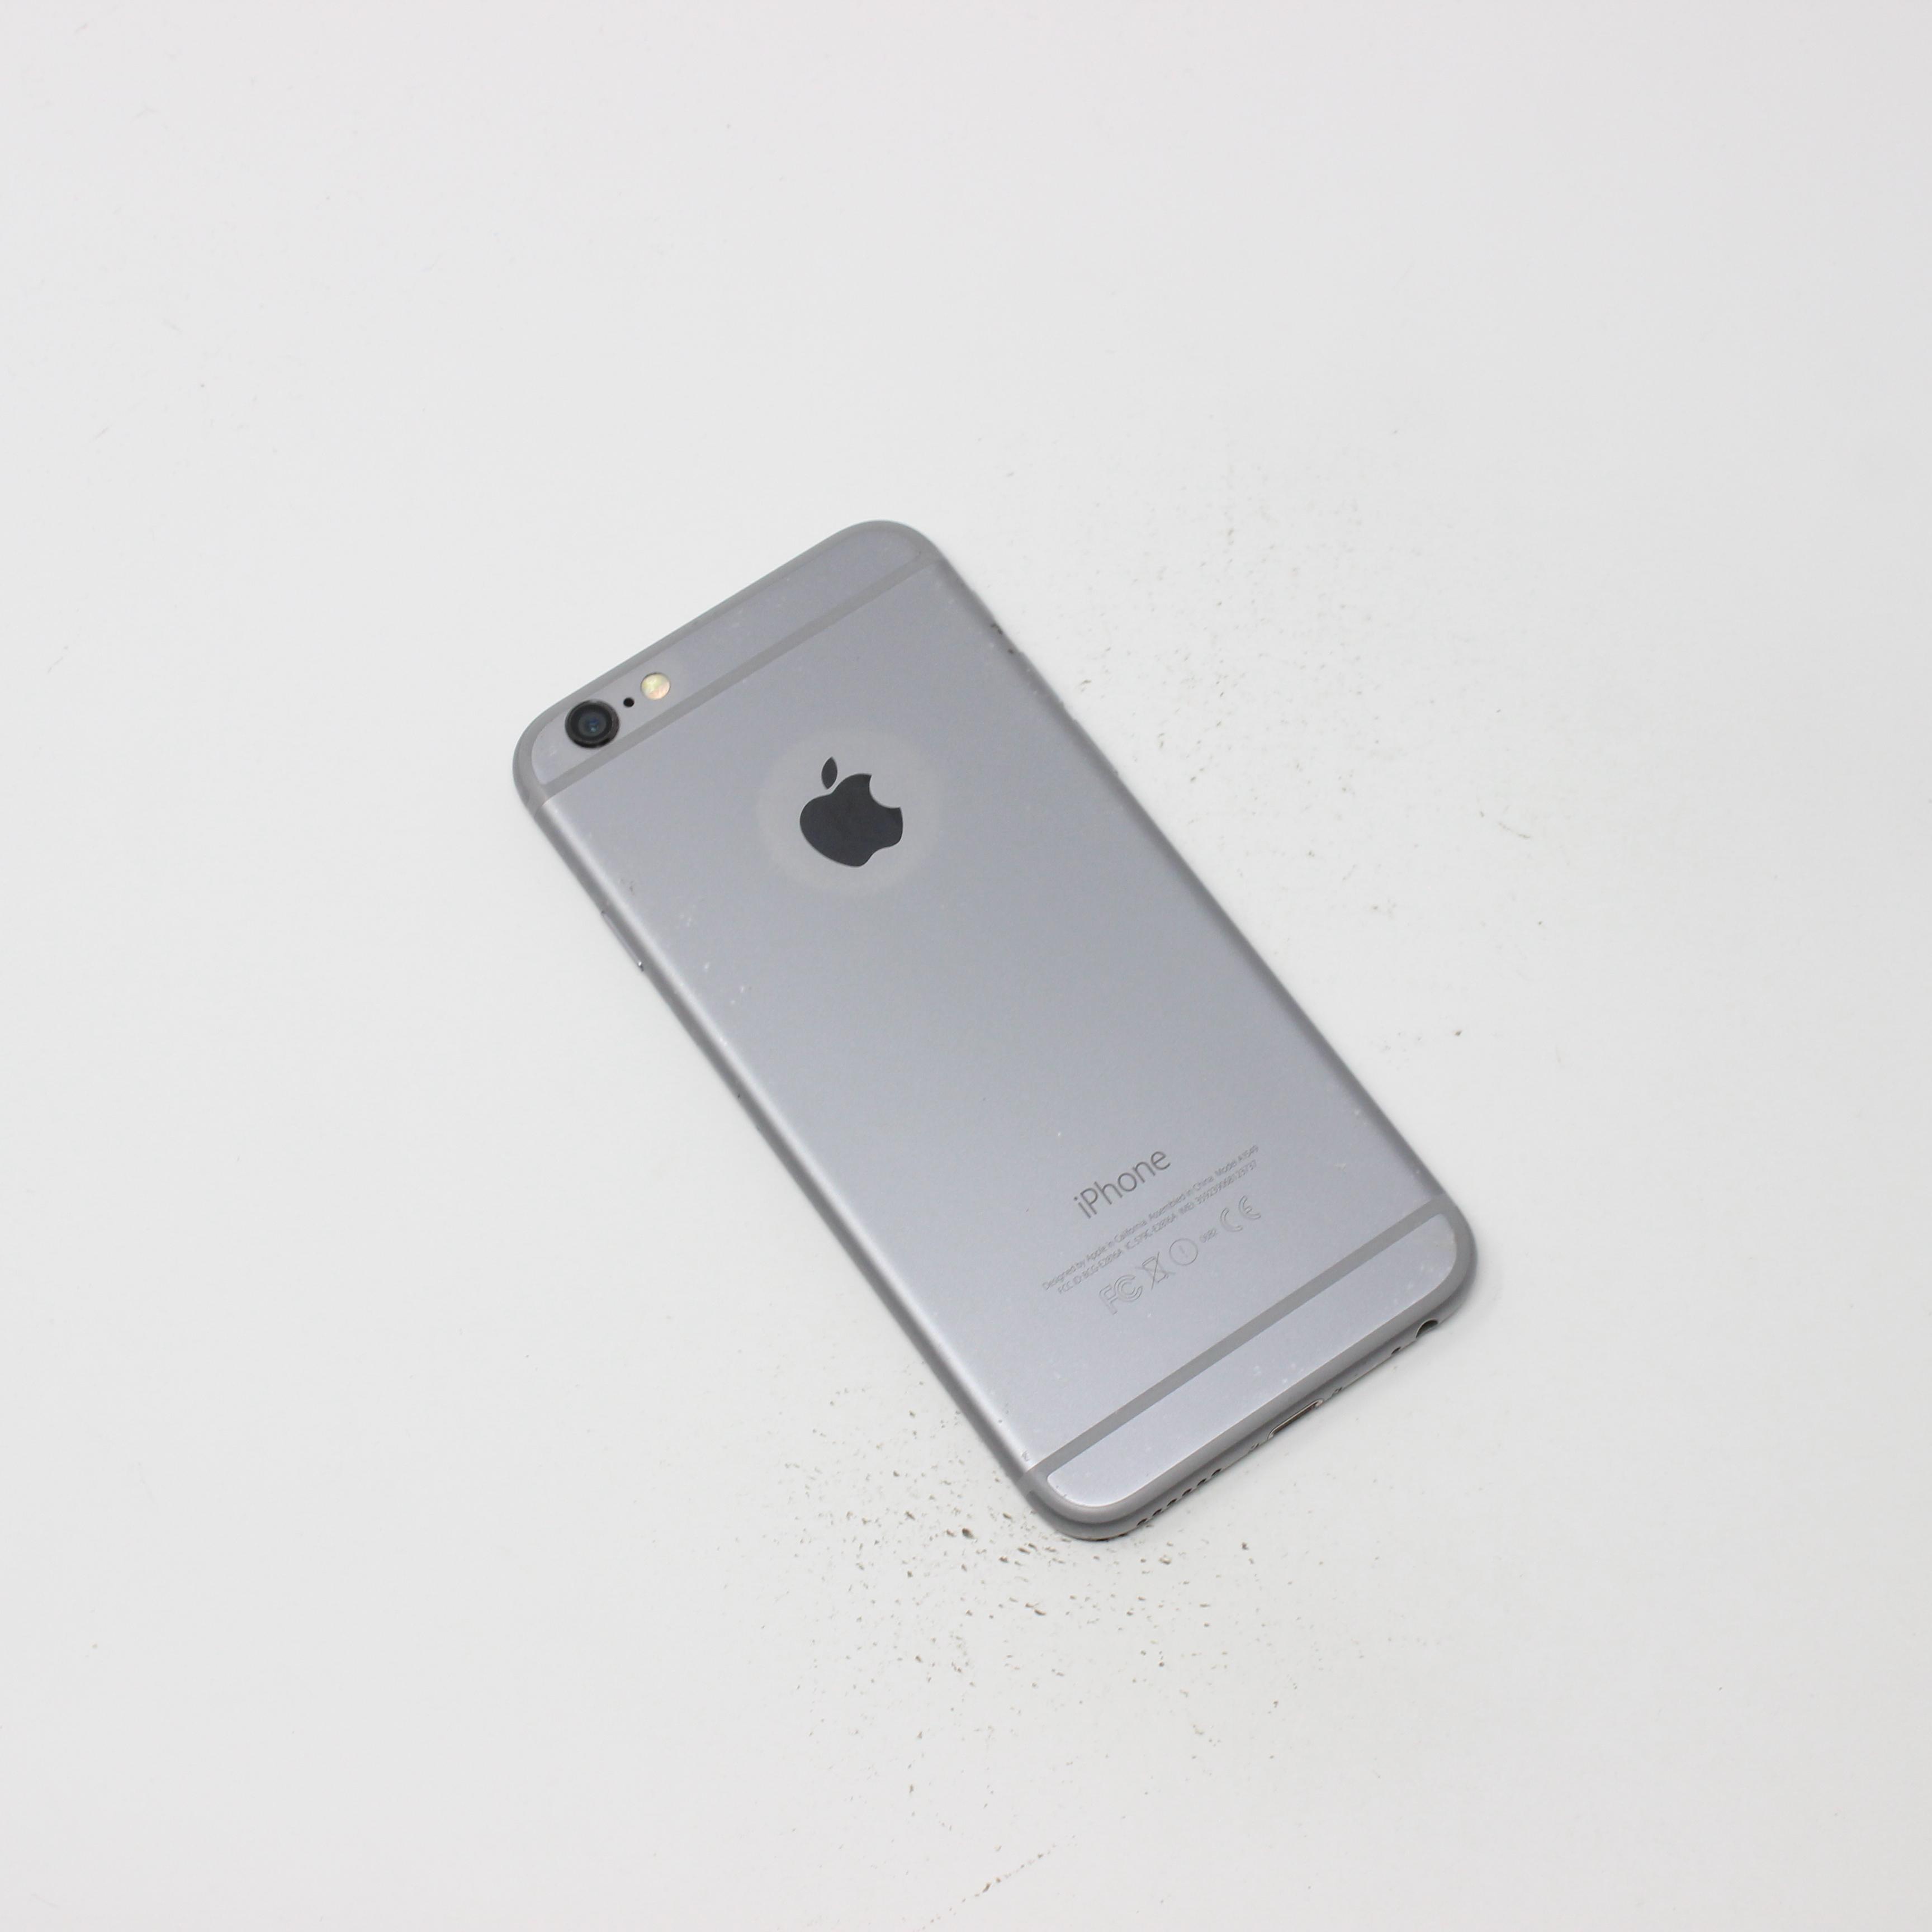 iPhone 6 64GB Space Gray - Verizon photo 3 | UpTradeit.com